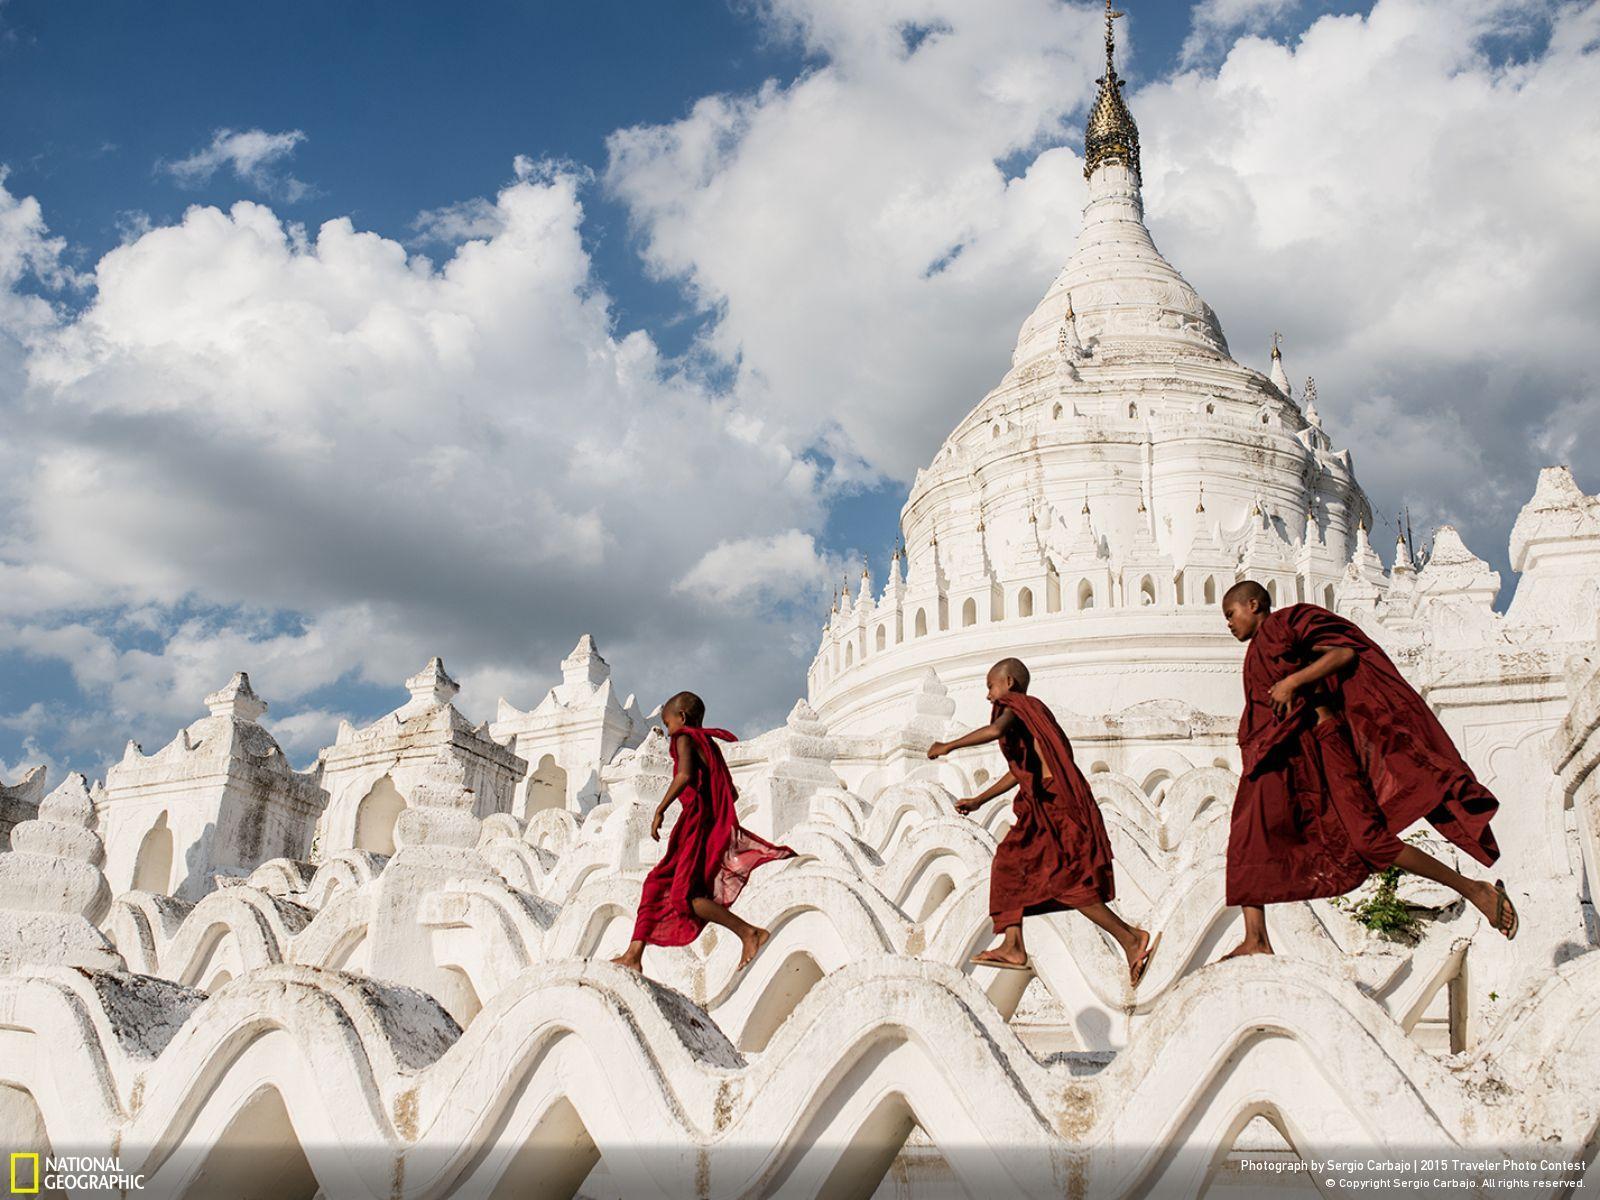 Myanmar, aka Burma, temple by Sergio Carbajo via National Geographic.